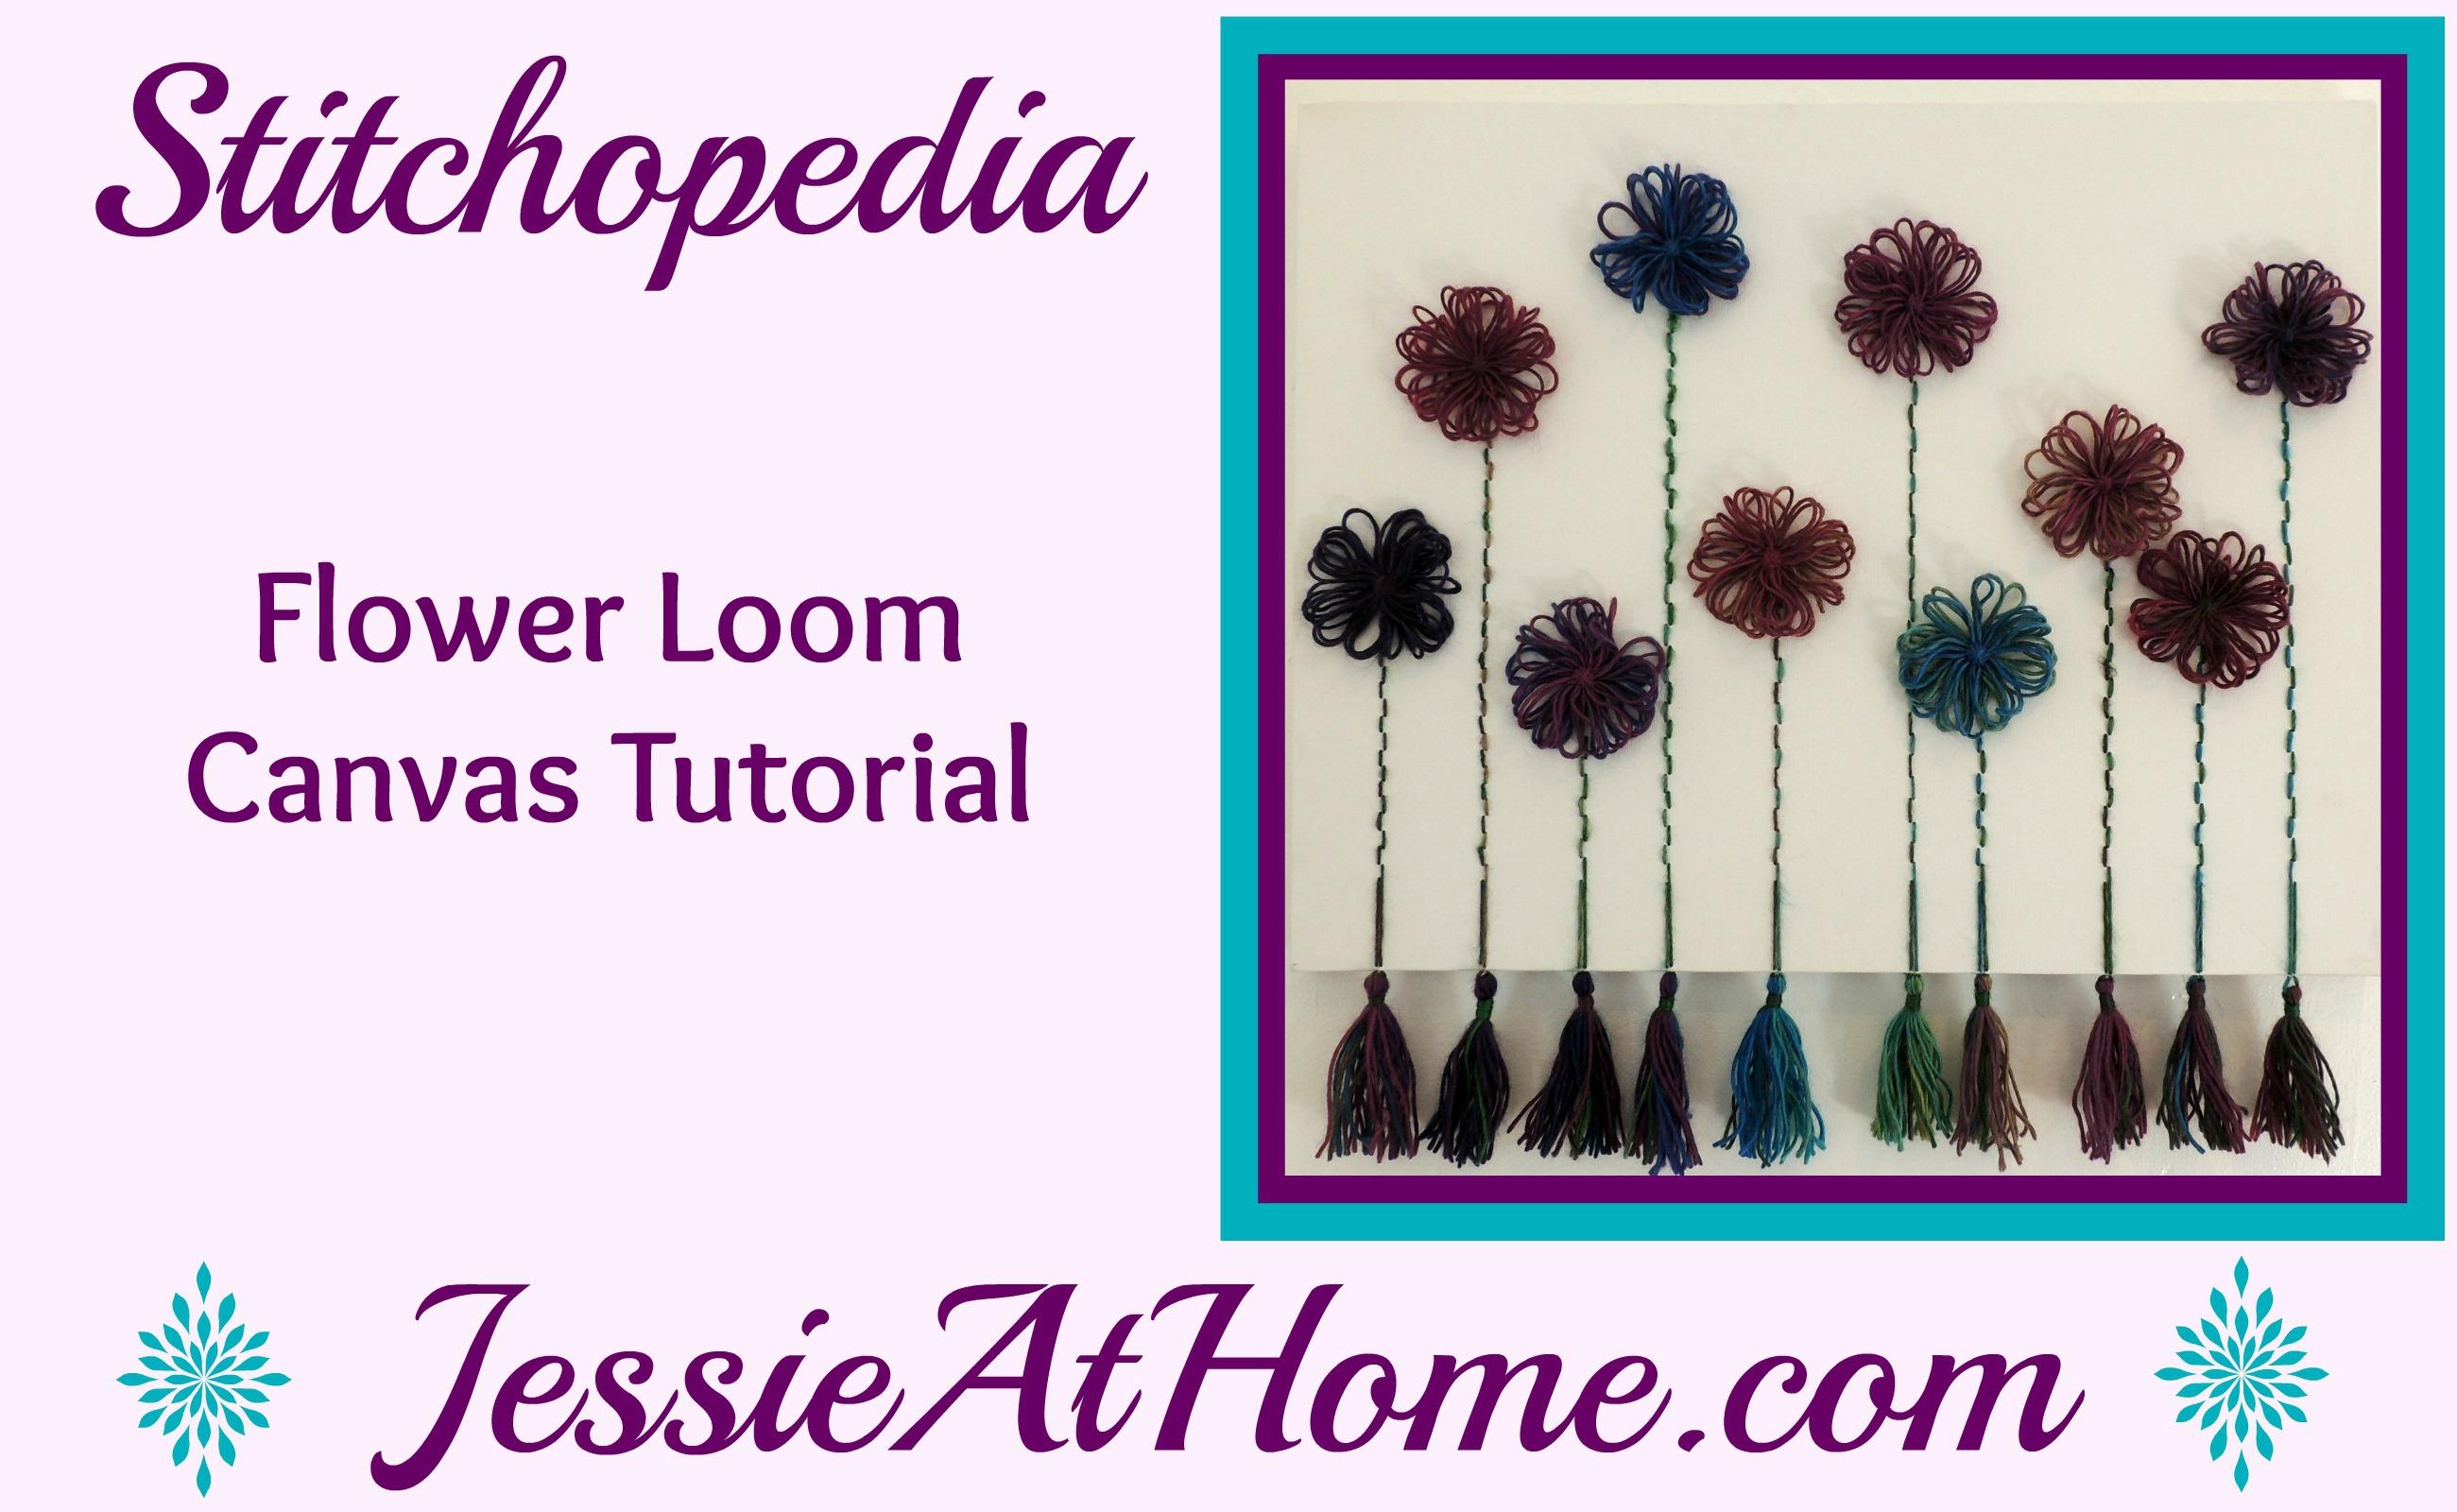 Stitchopedia Flower Loom Canvas Tutorial